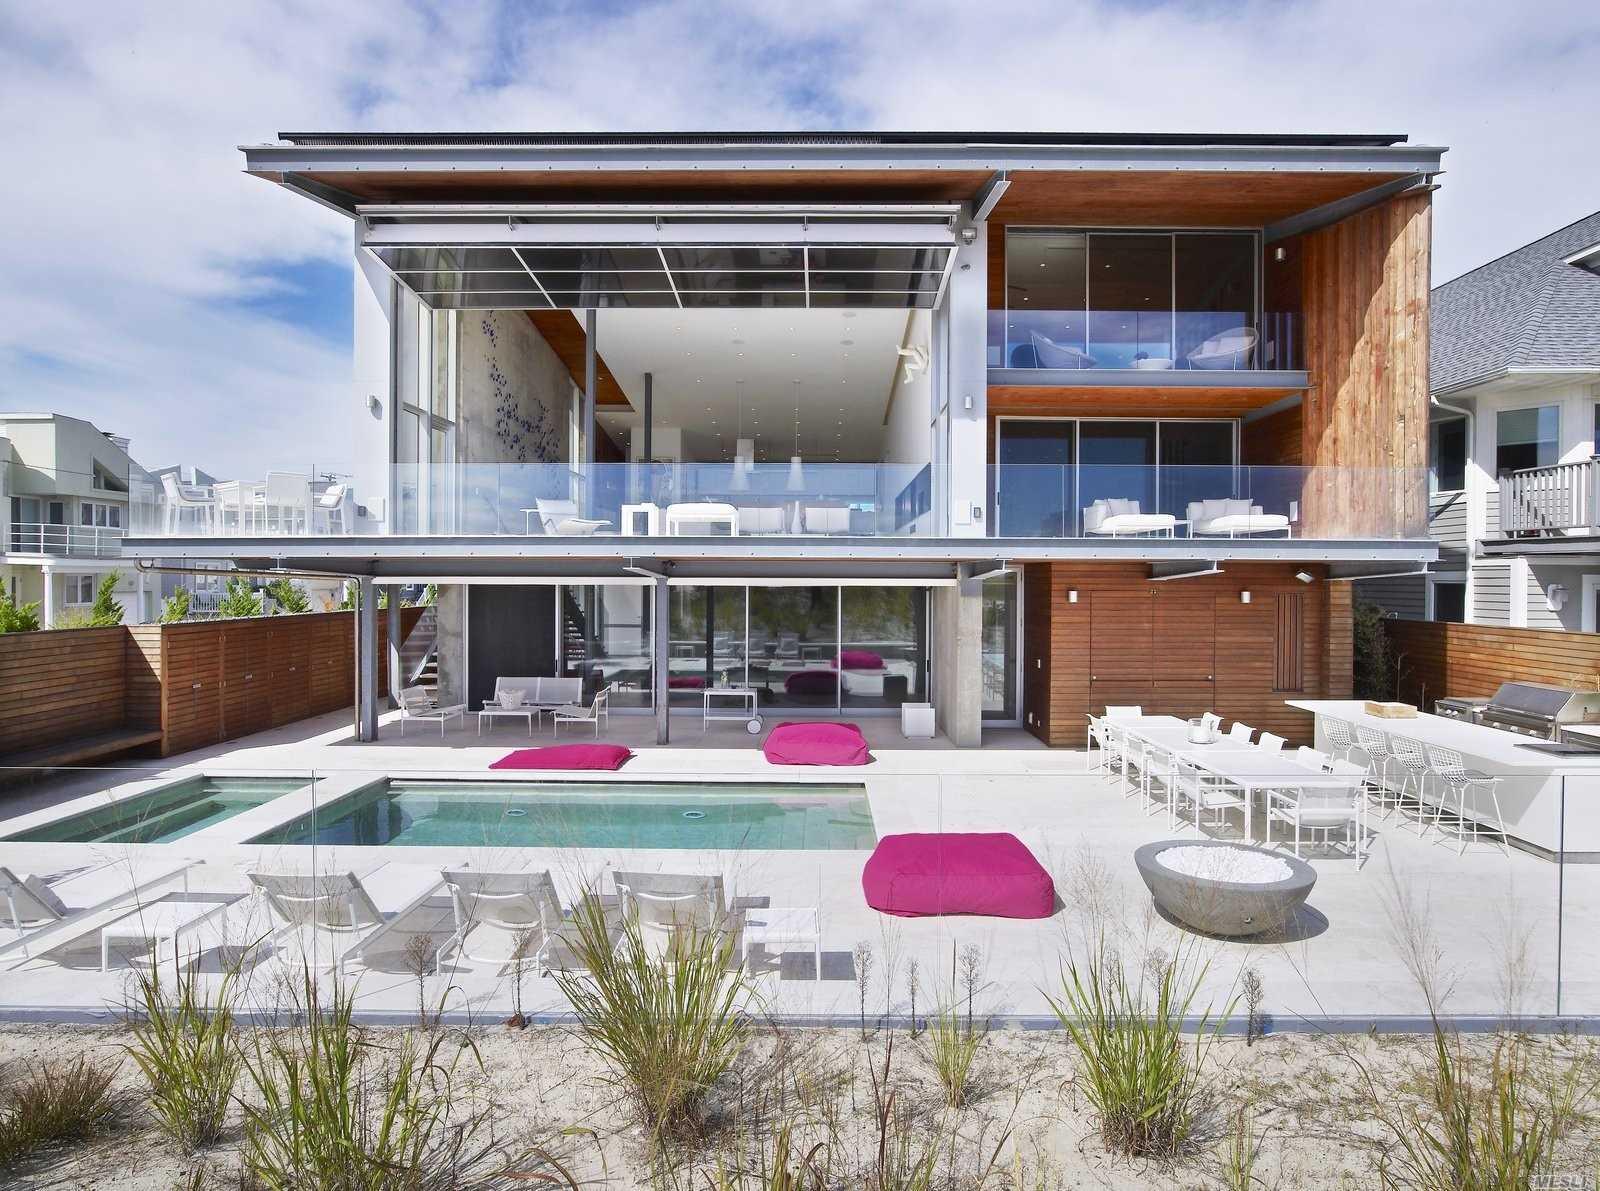 1029 Oceanfront Ave, Long Beach, NY 11561